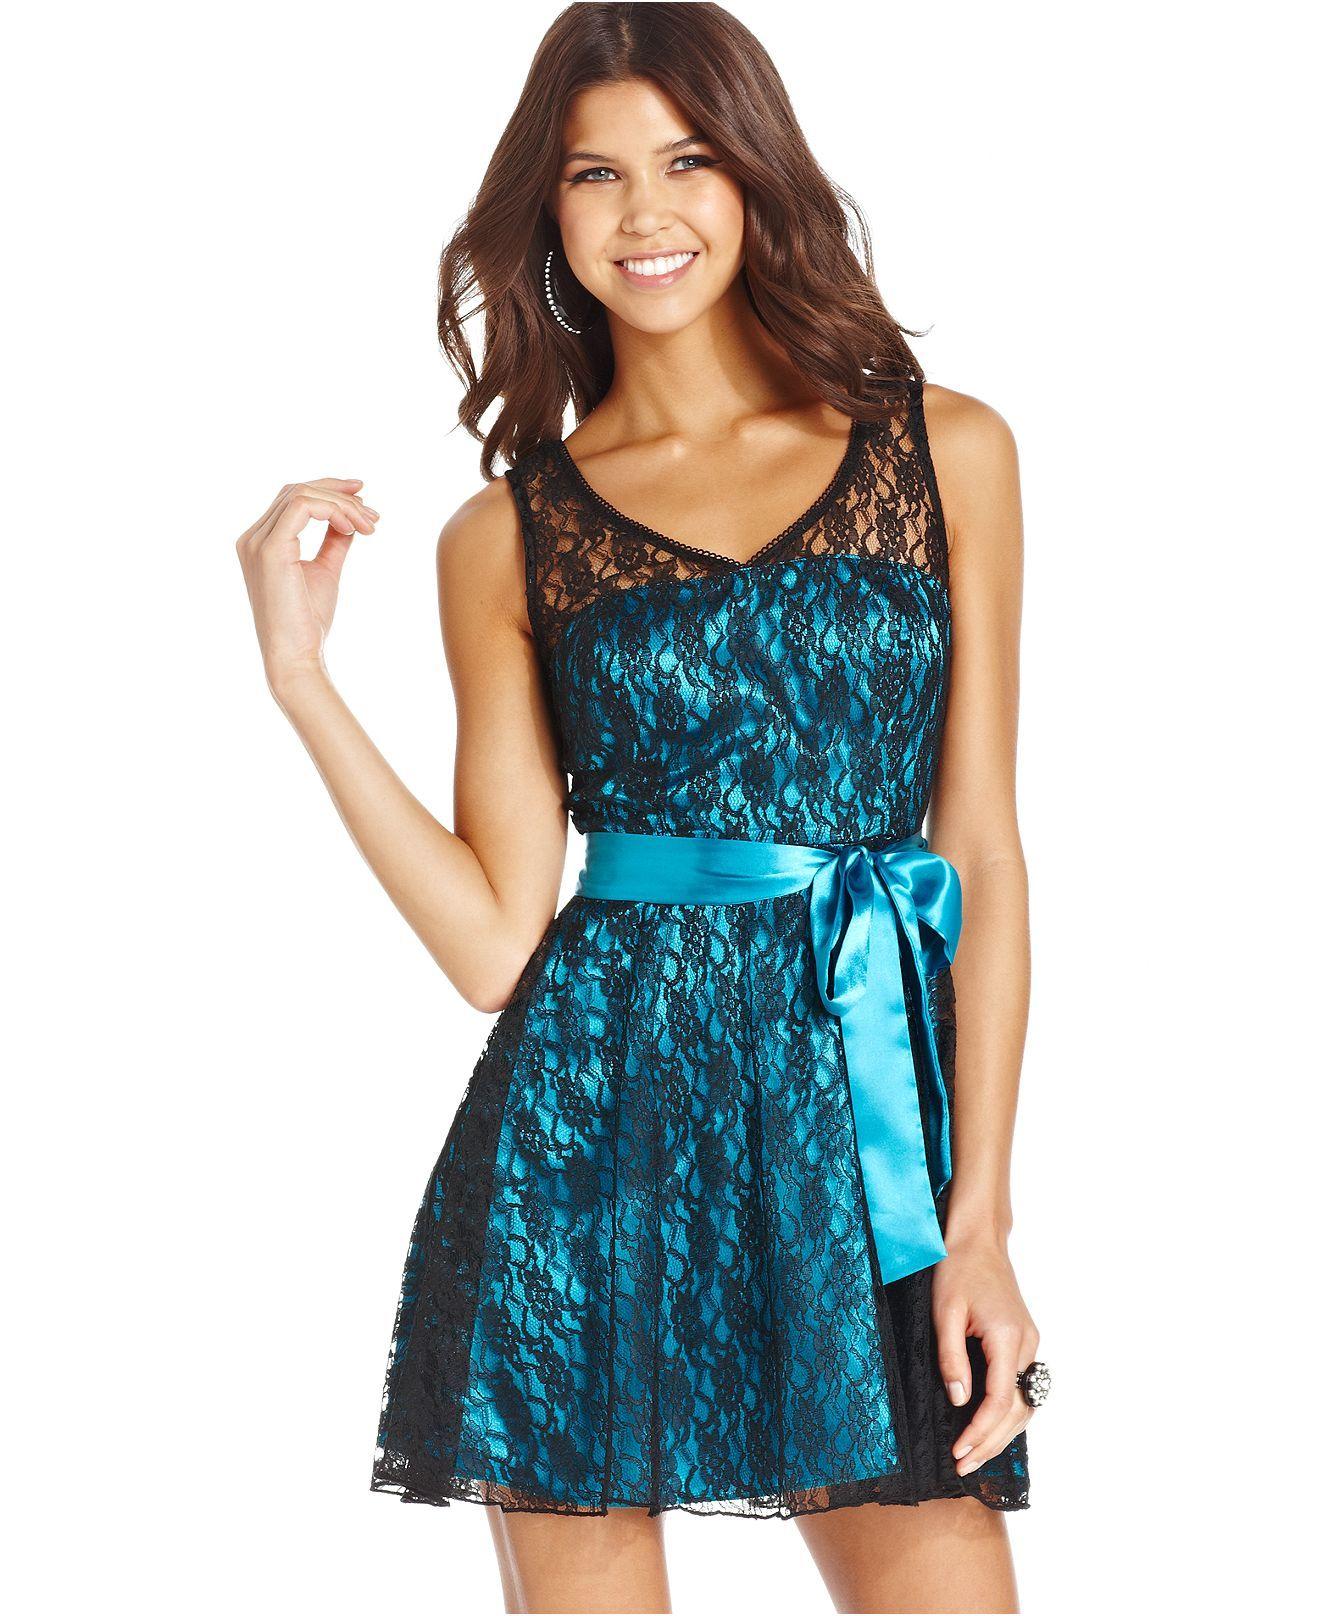 Fantastic Macys Junior Prom Dresses Ideas - Wedding Ideas ...